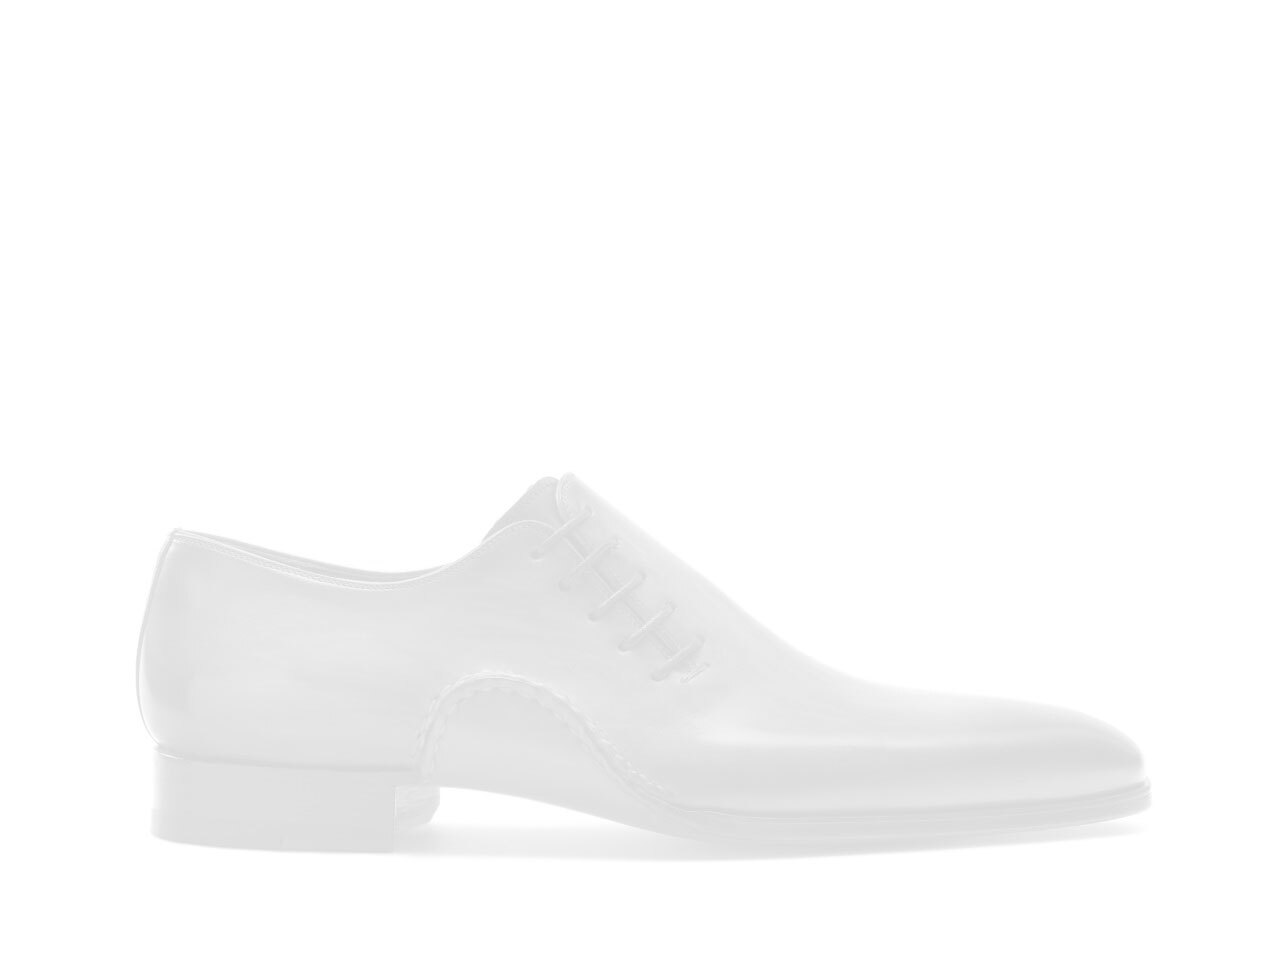 Sole of the Magnanni Playa Stitch Red Men's Sandal Slides